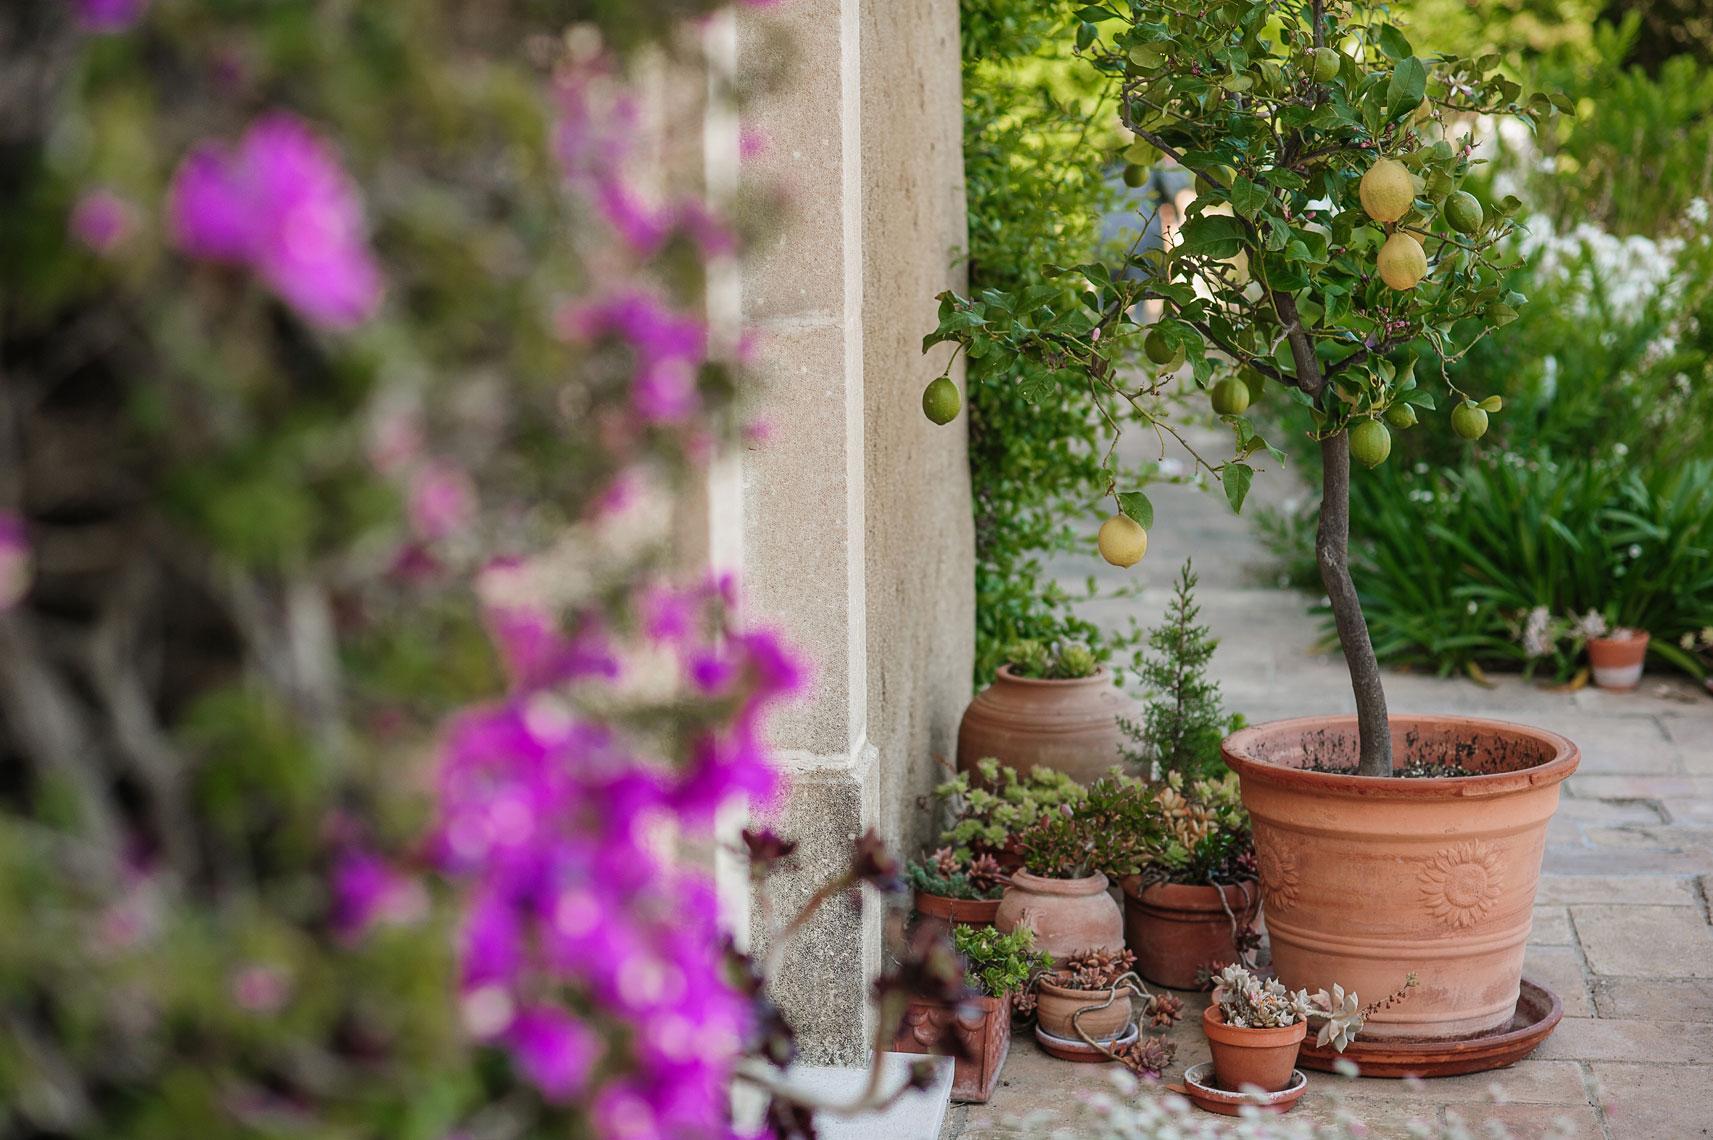 Villa-Turquoise---Victor-Perez-Architectural-Photographer-28.jpg